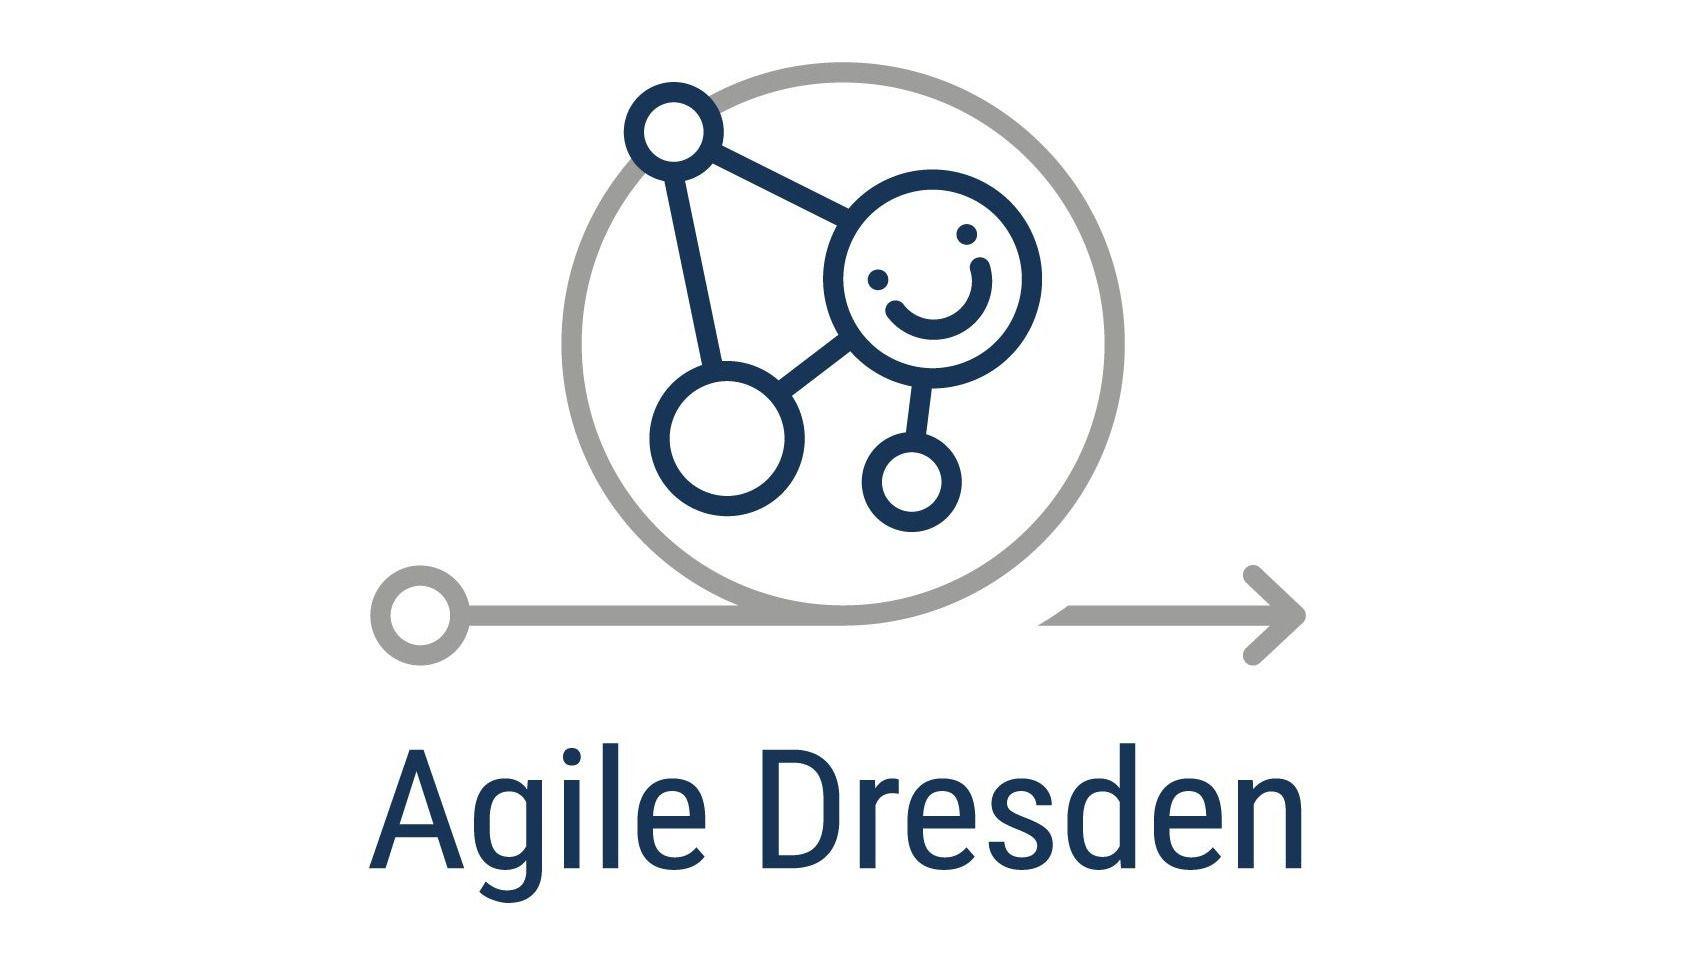 Agile Dresden